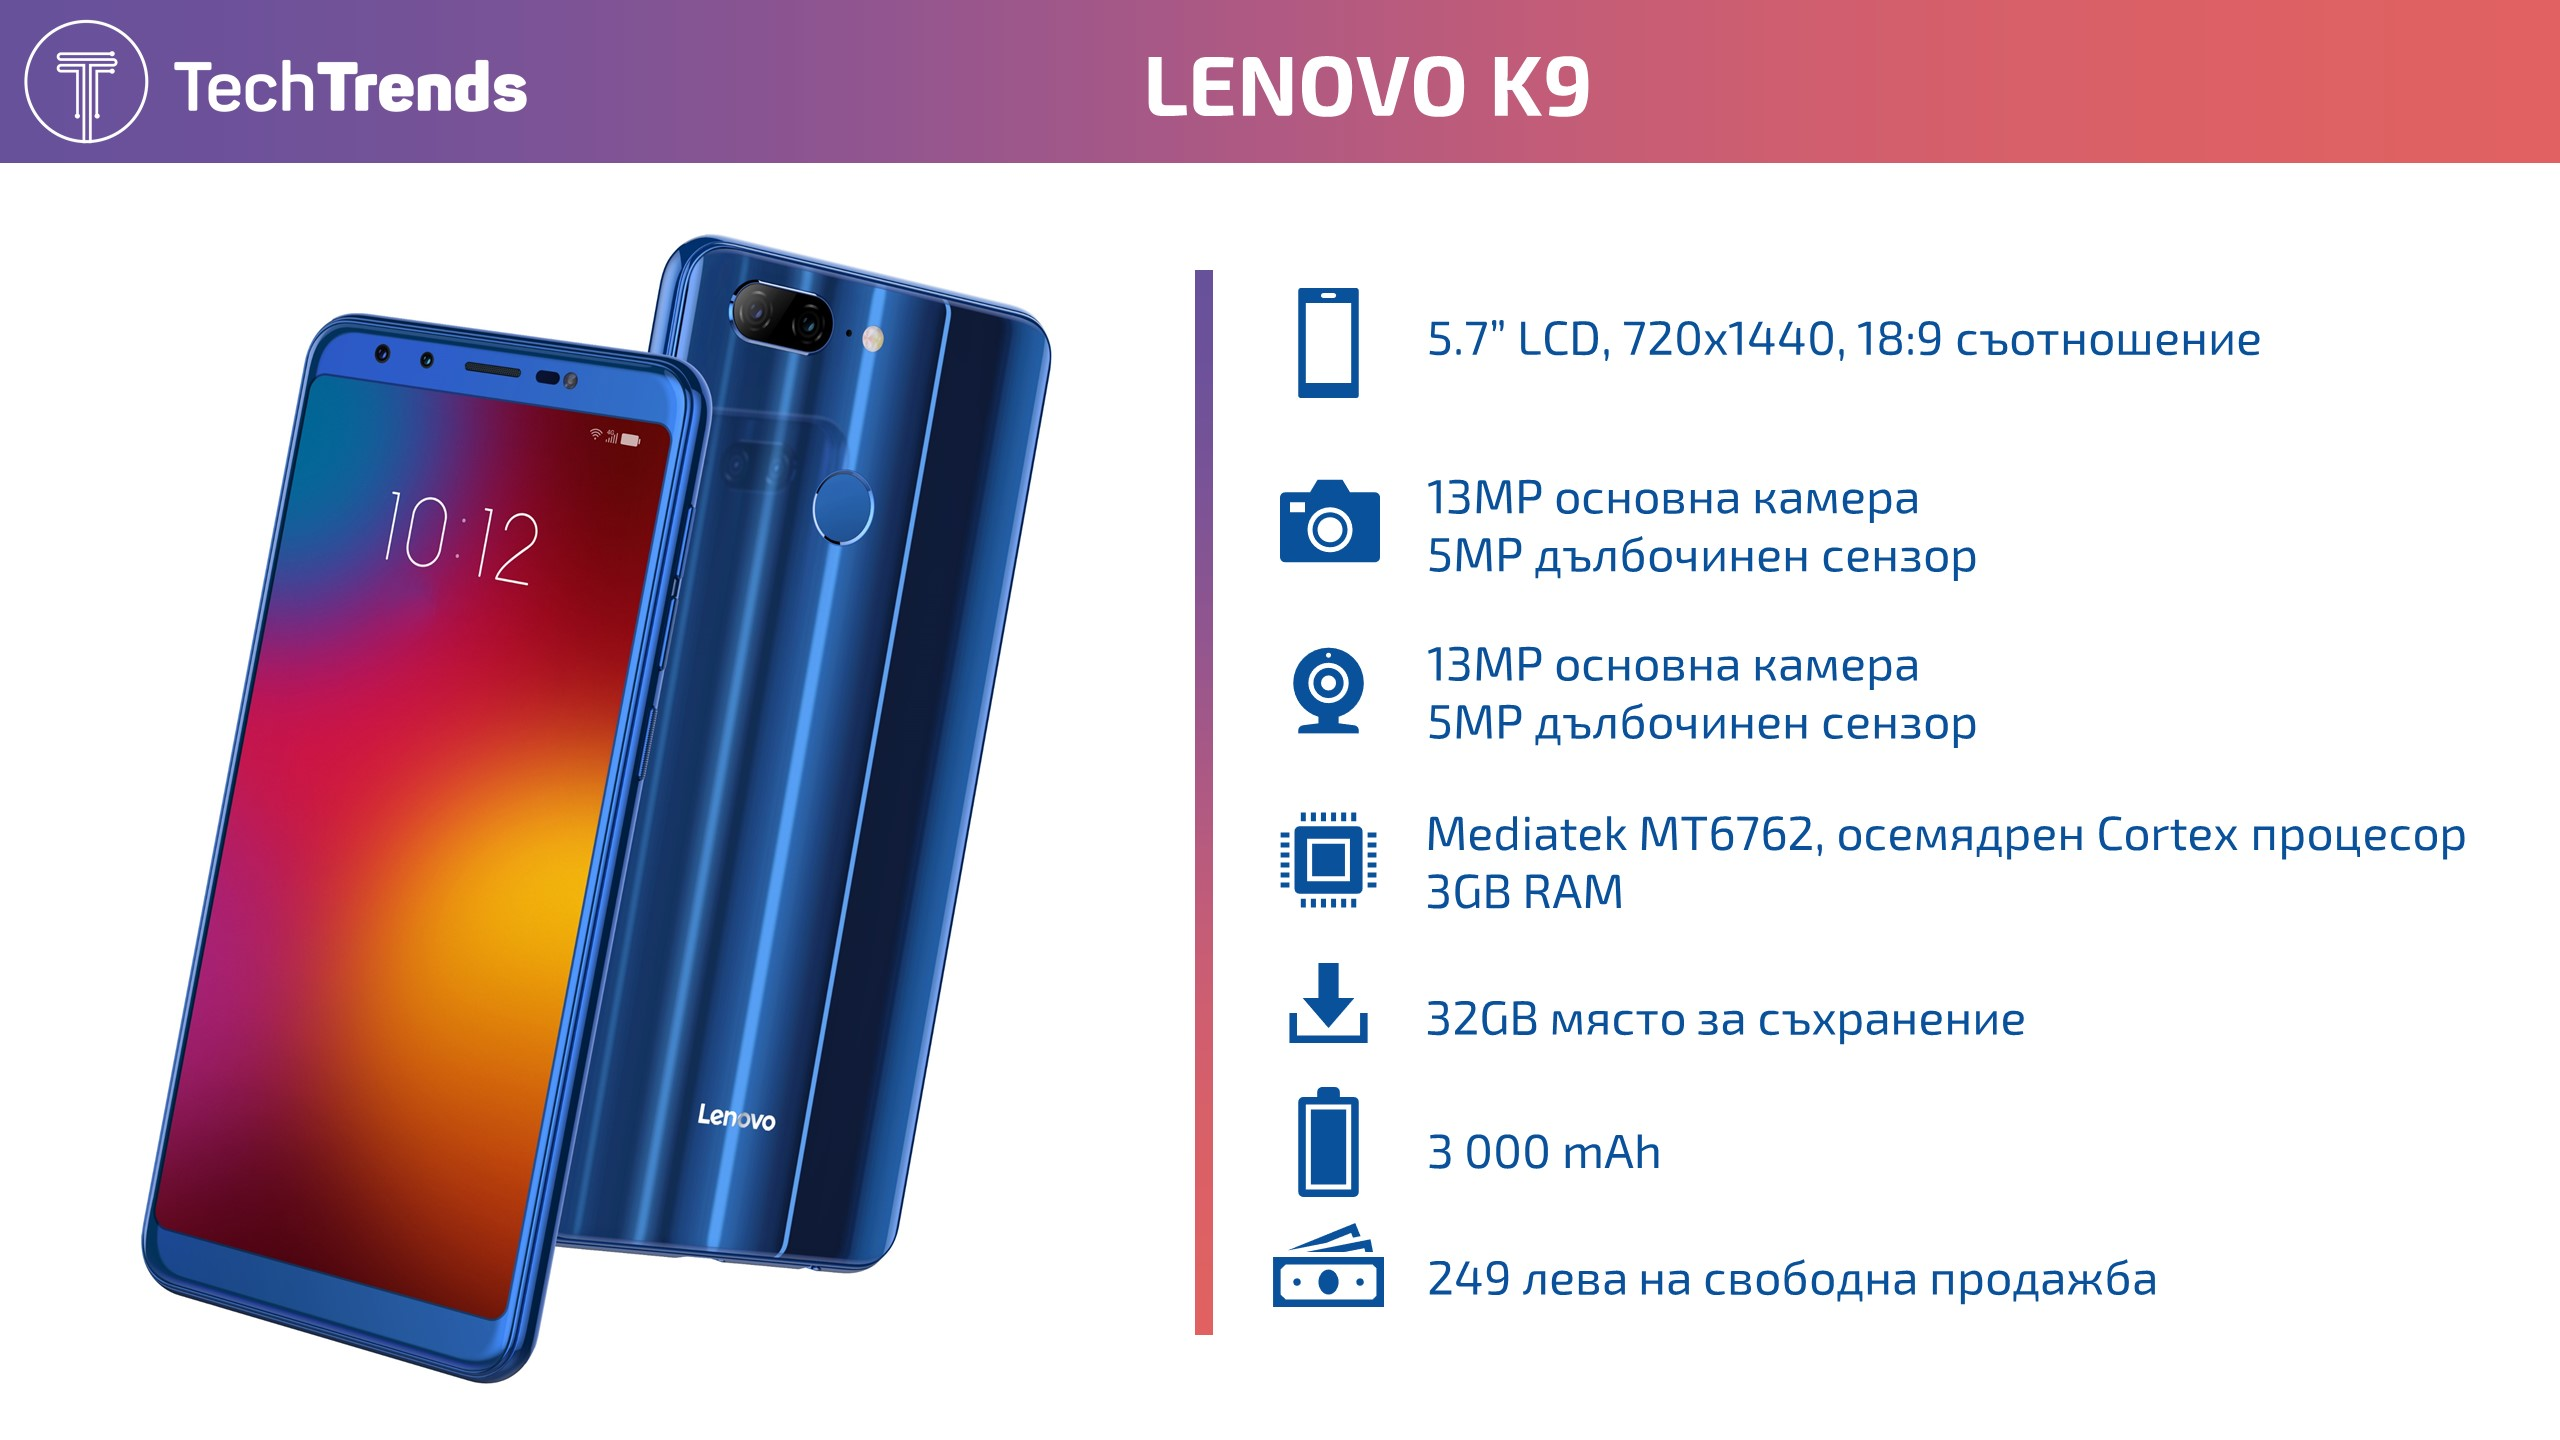 Lenovo K9 Infographic